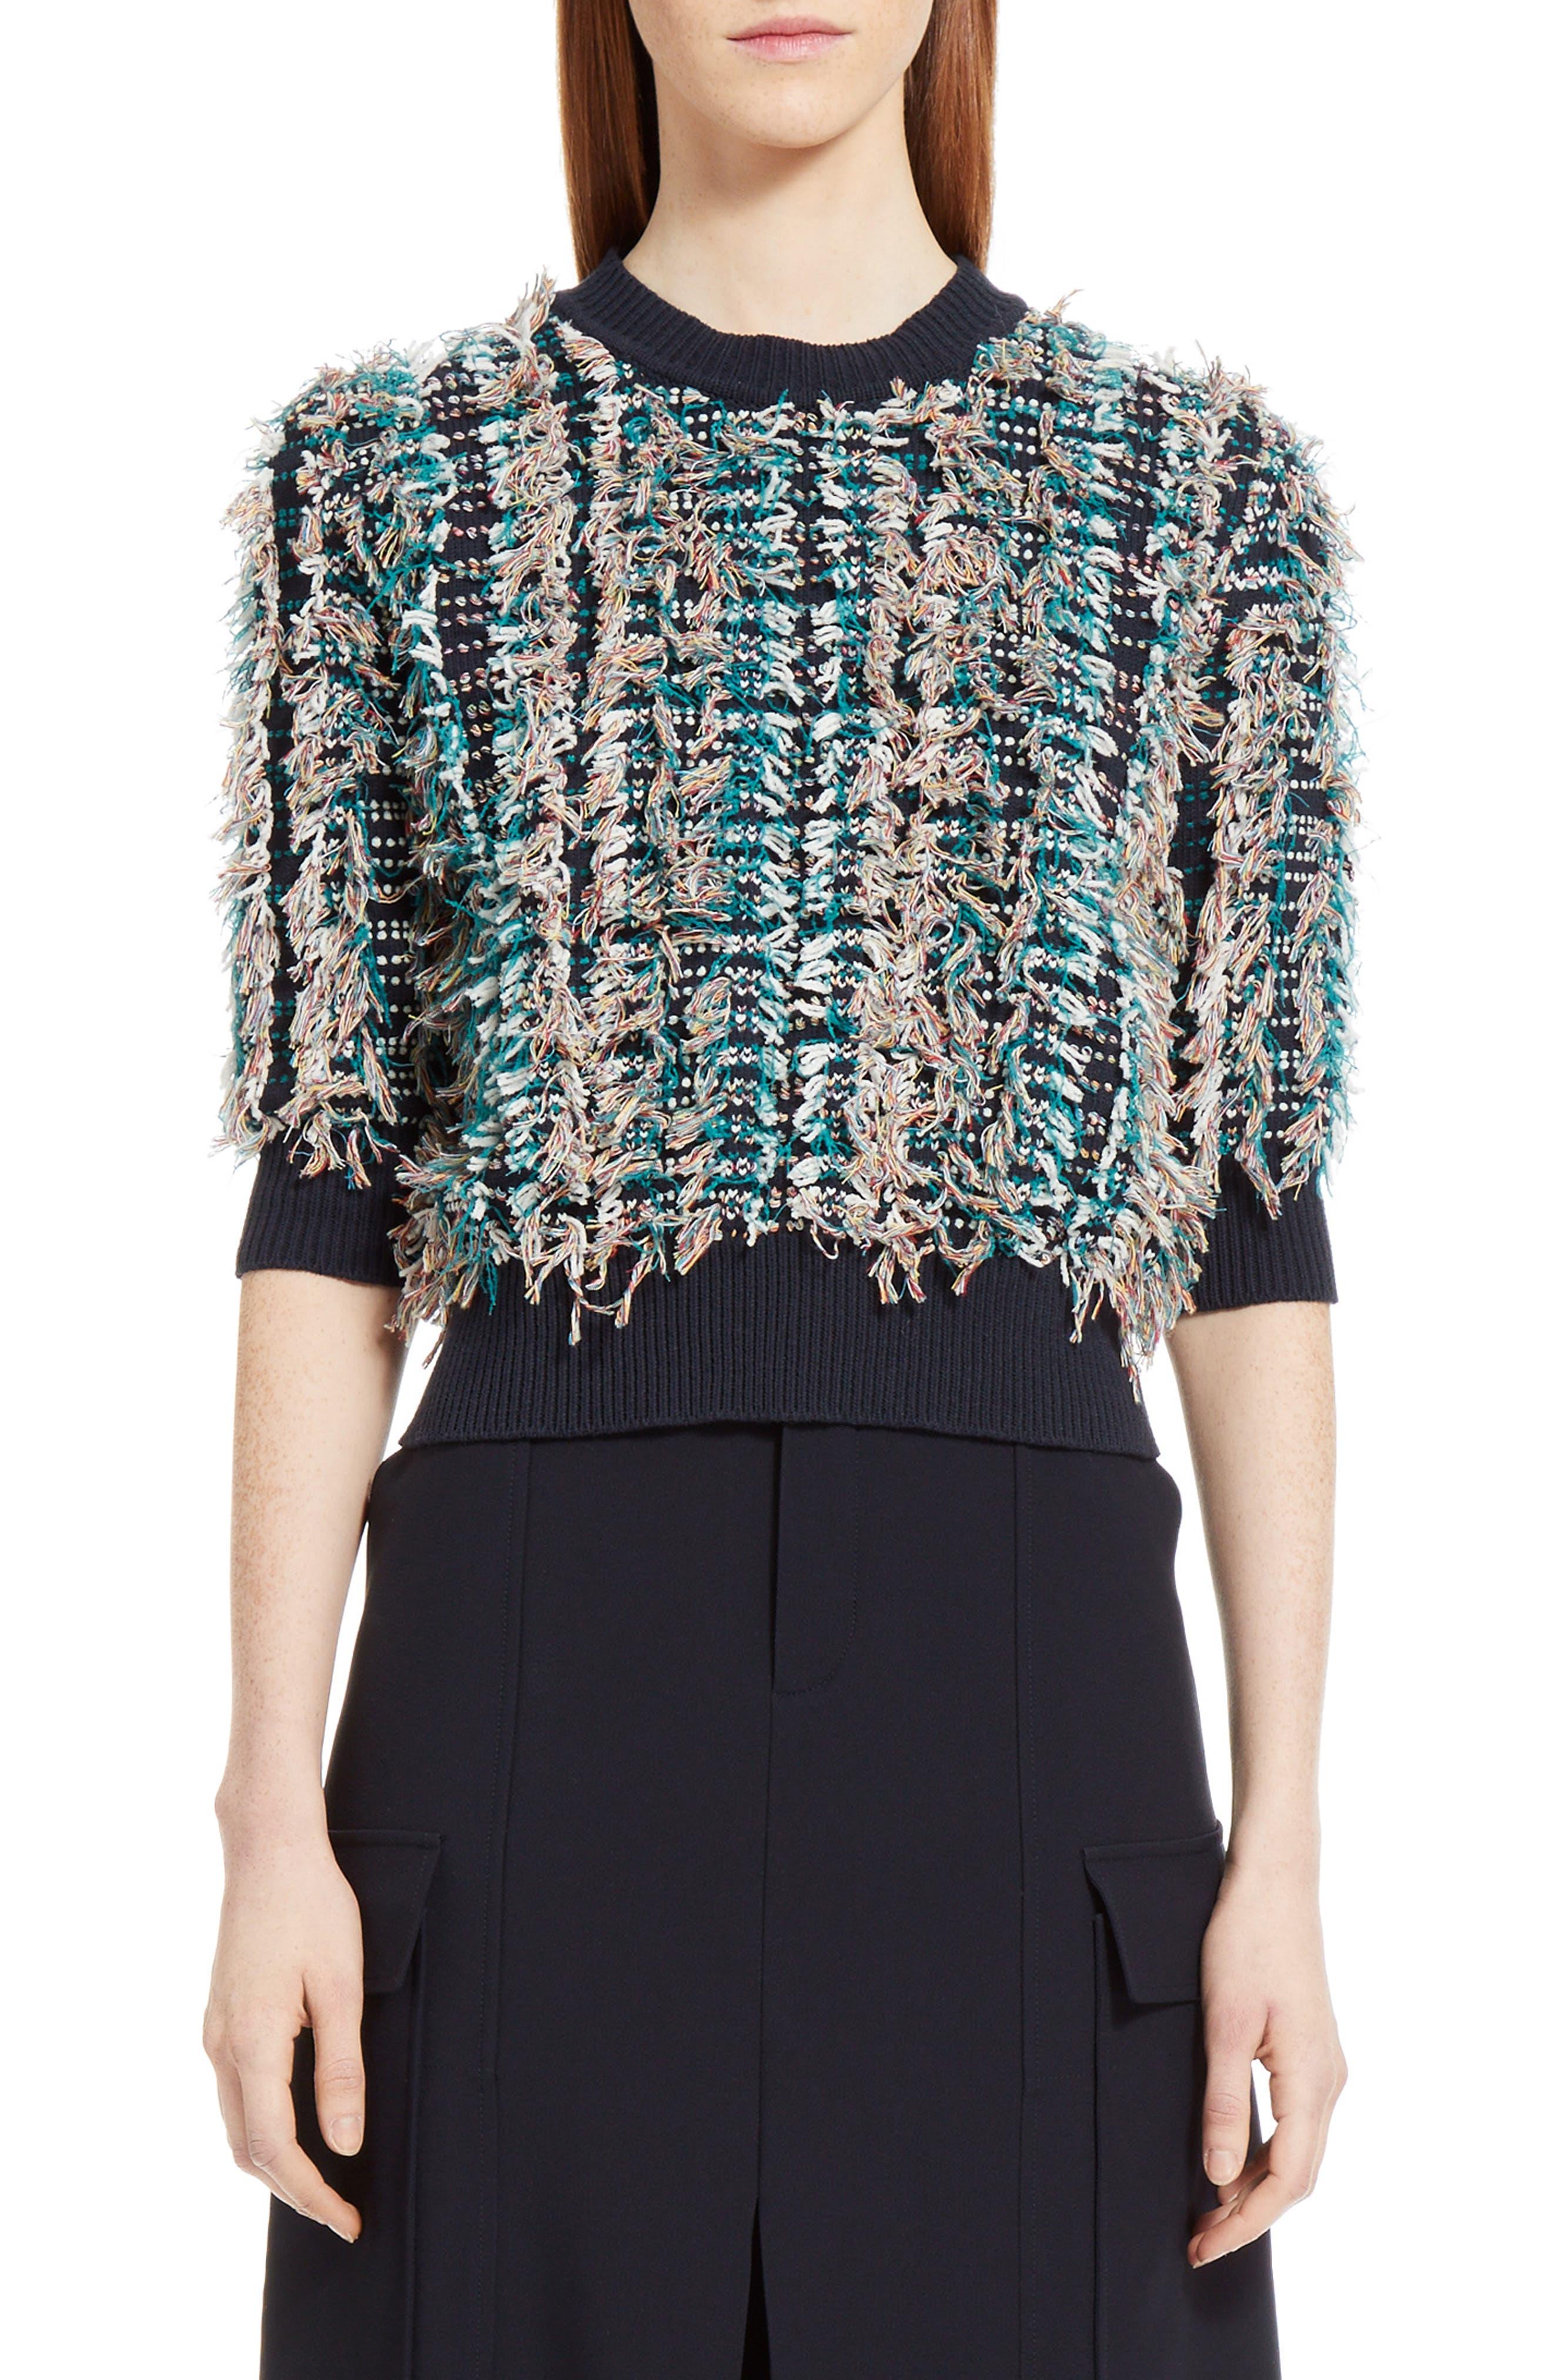 Alternate Image 1 Selected - Chloé Fringe Knit Sweater